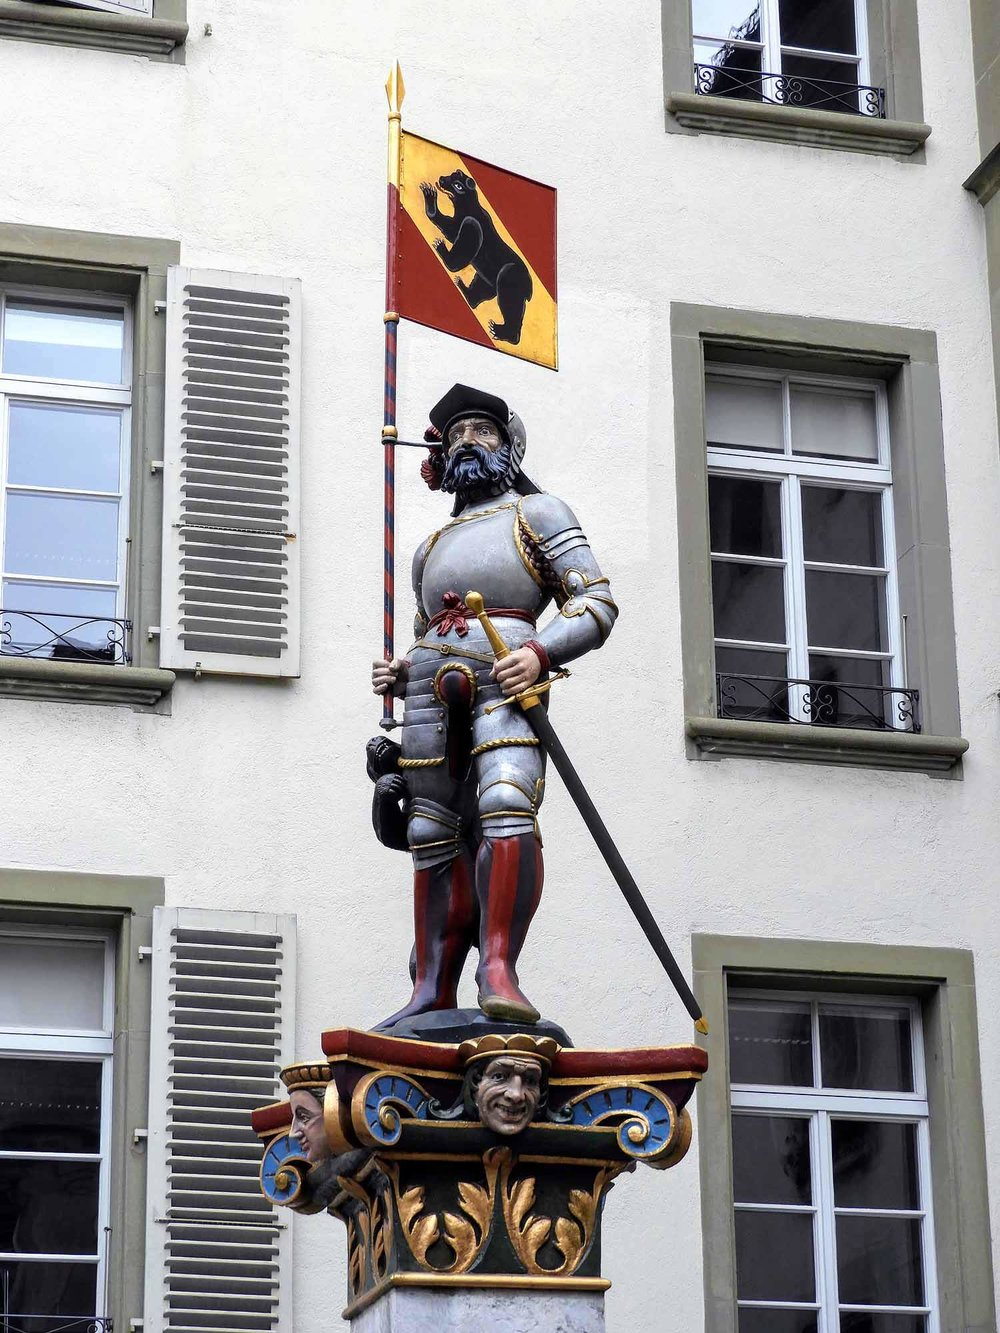 switzerland-bern-knight-statue.jpg